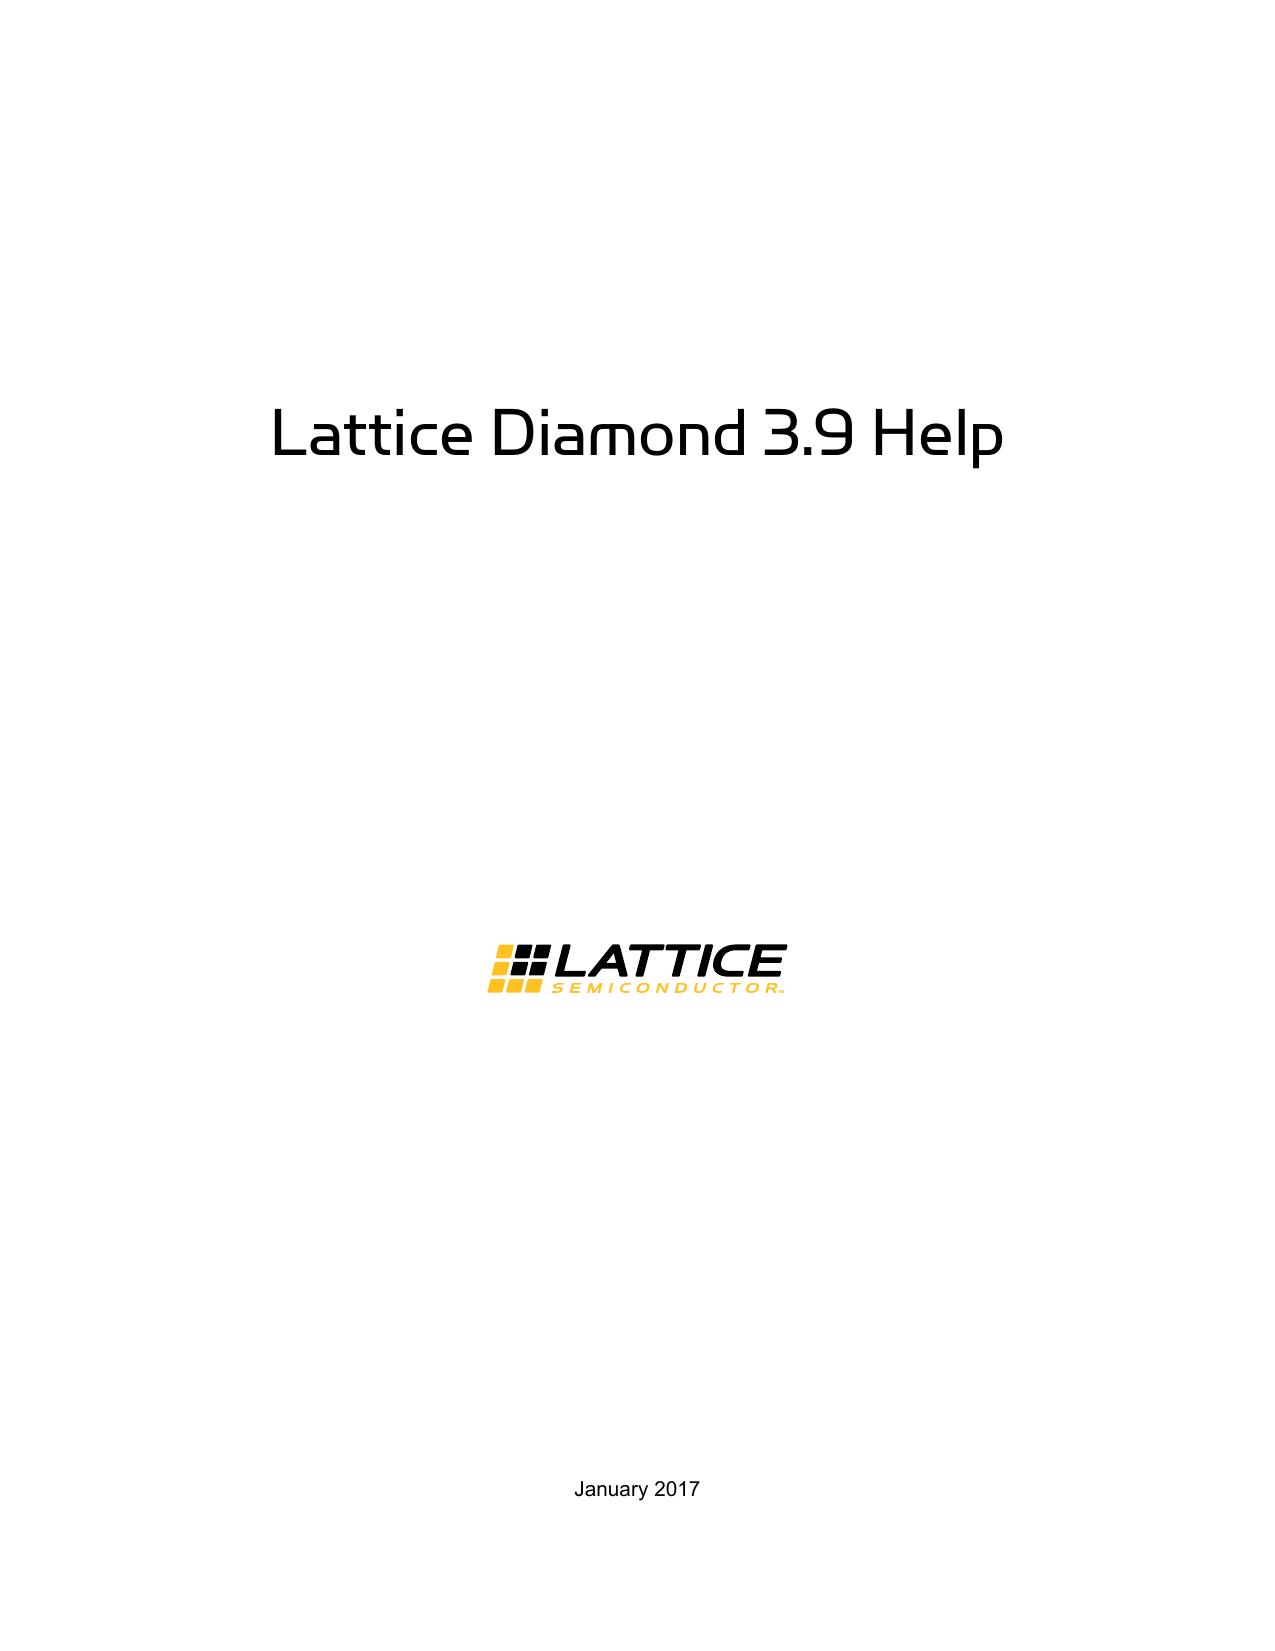 Lattice Diamond Help - Lattice Semiconductor | manualzz com